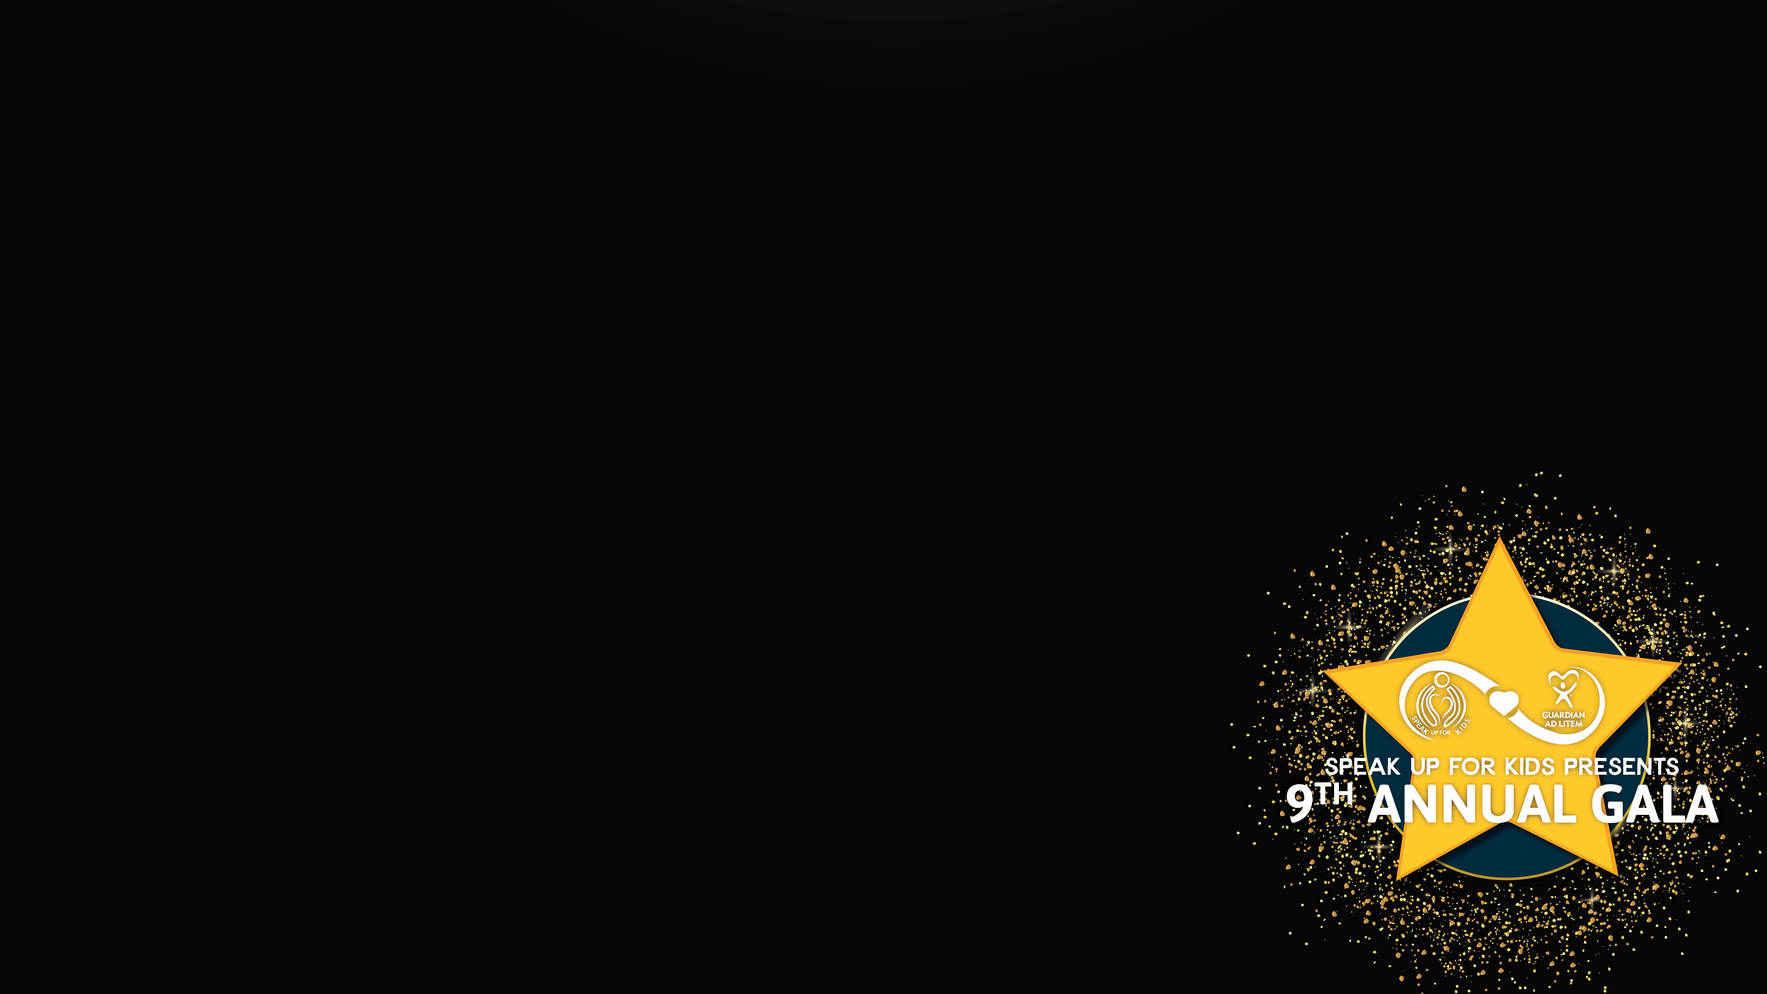 9th Annual Gala 2020 image